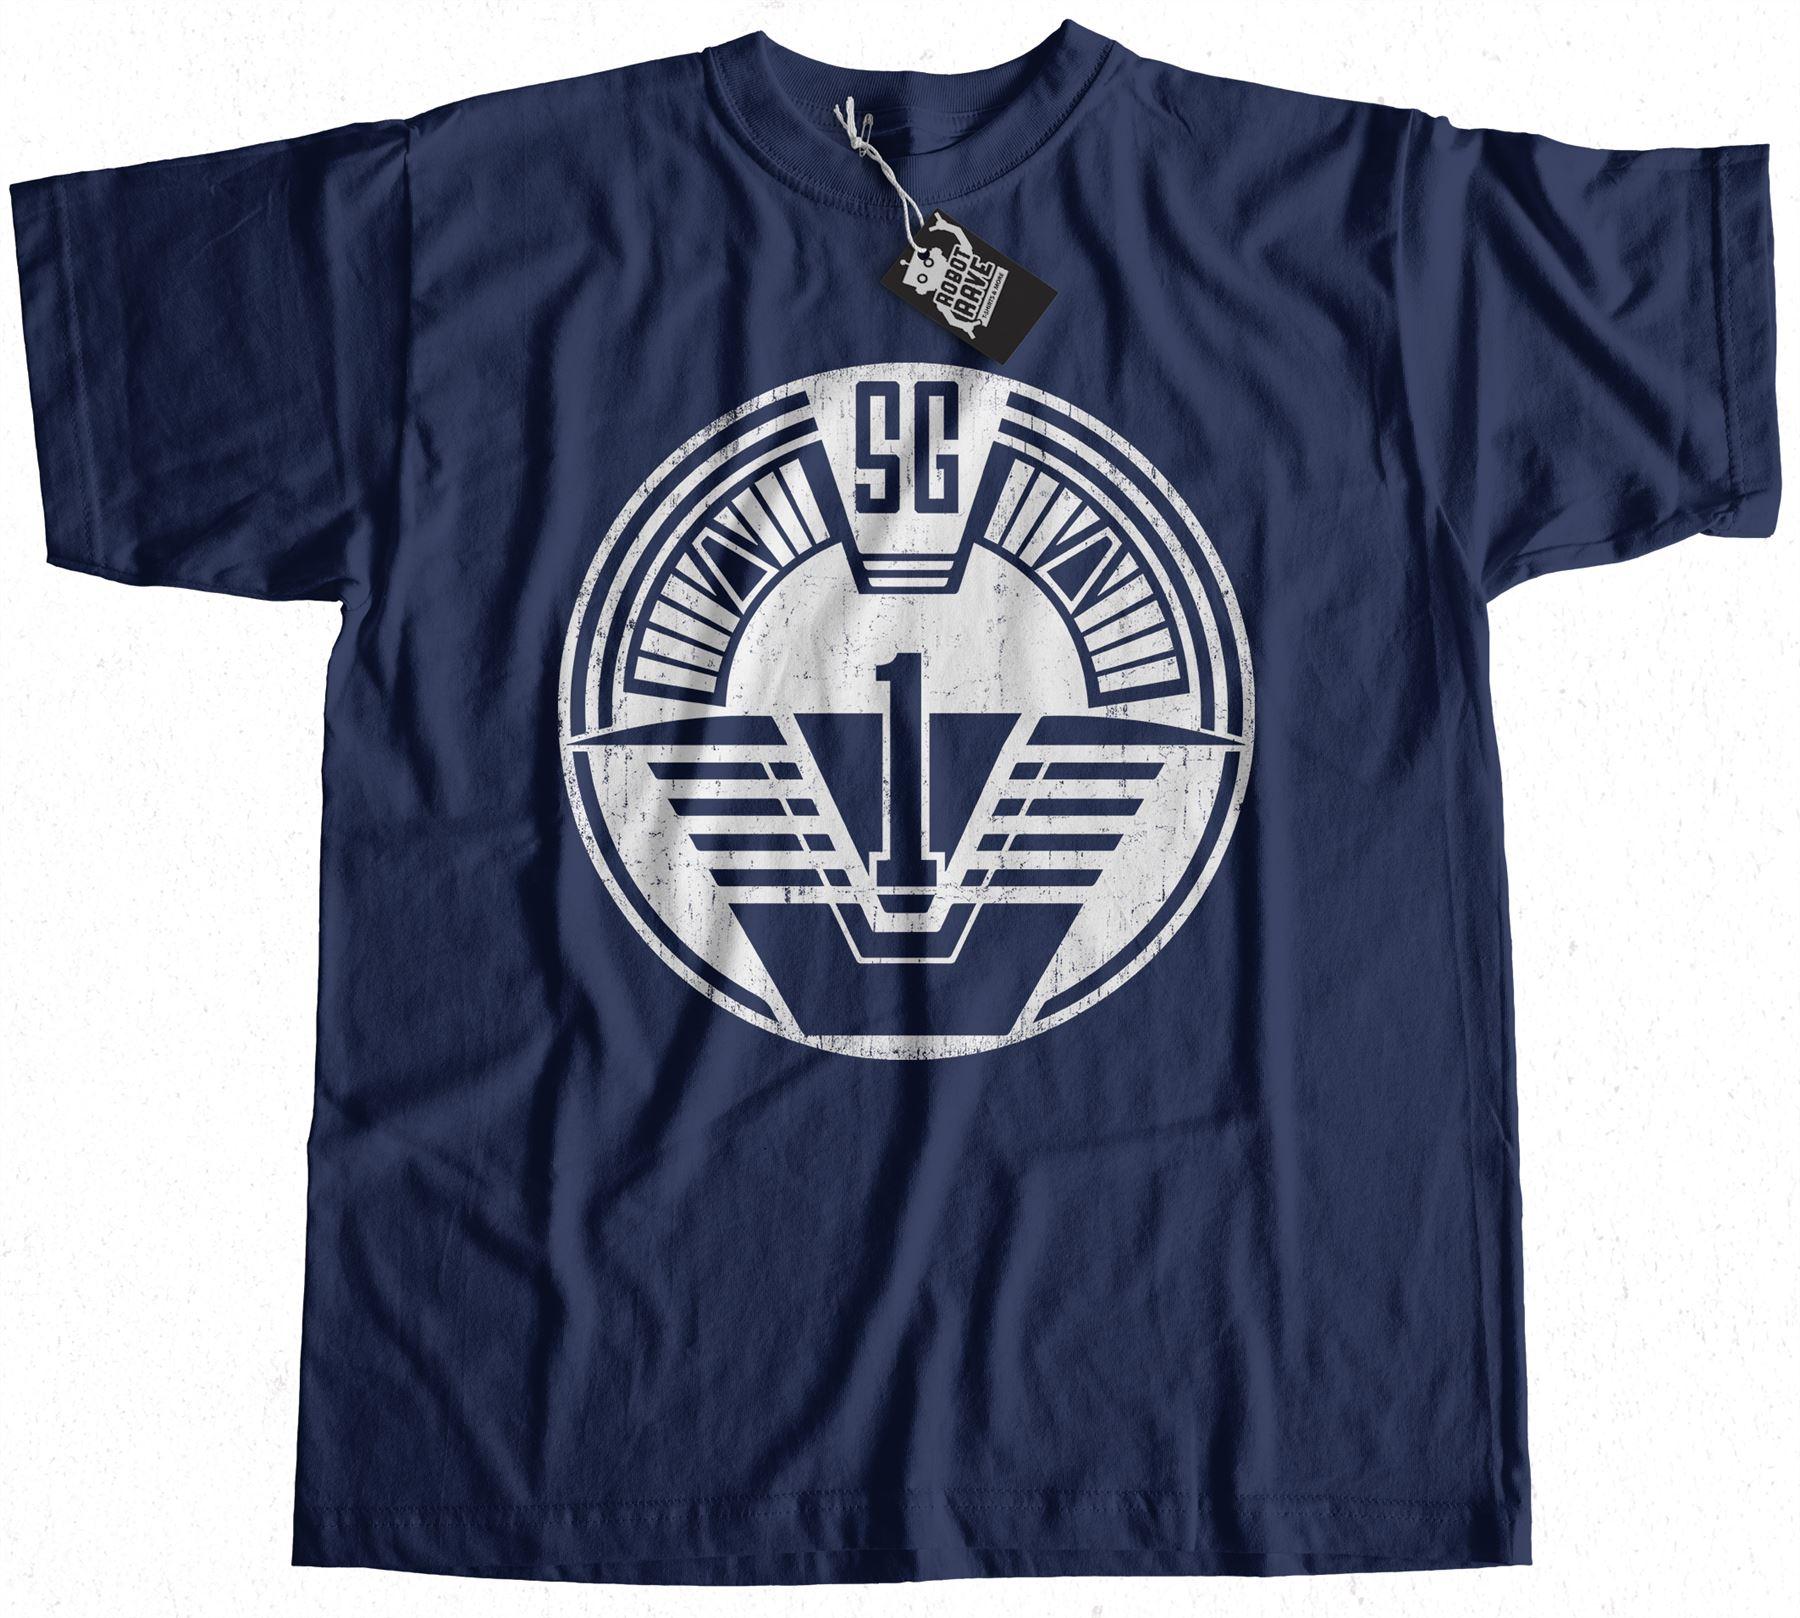 SG1-T-Shirt-100-Premium-Cotton Indexbild 19